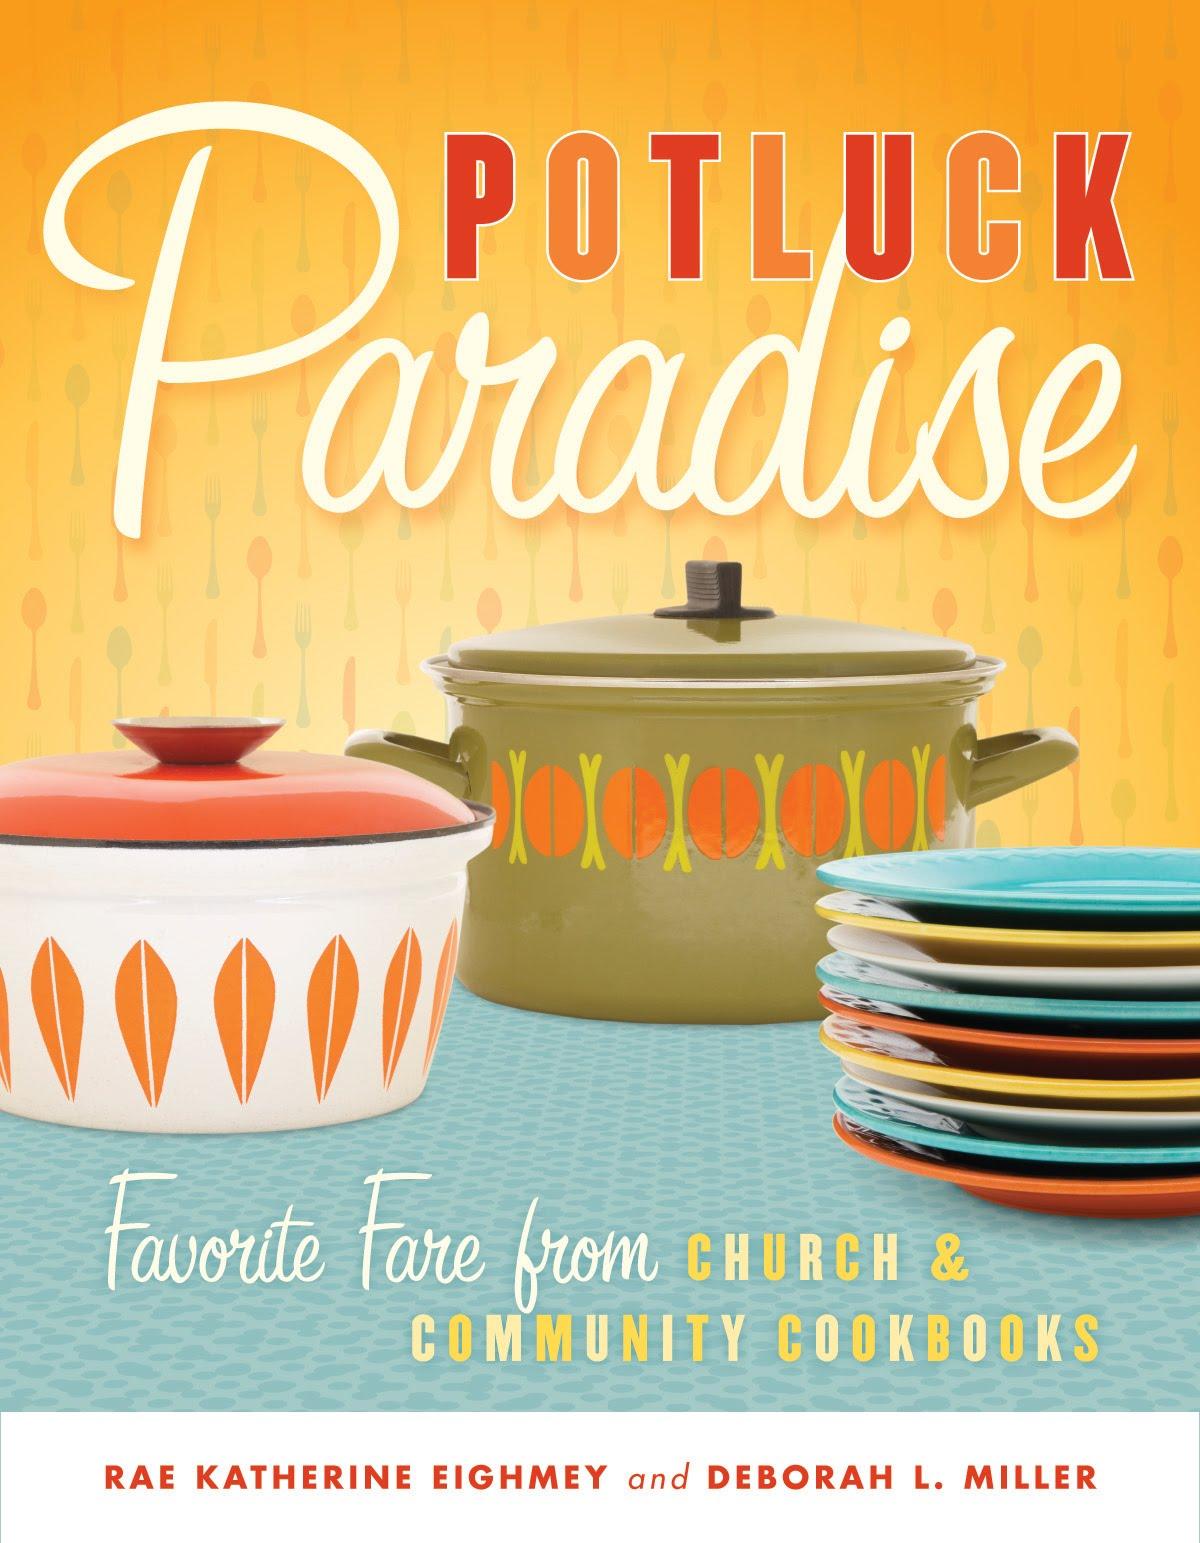 Potluck dinner invite wording best printable invitation design potluck paradise just what is potluck paradise stopboris Images